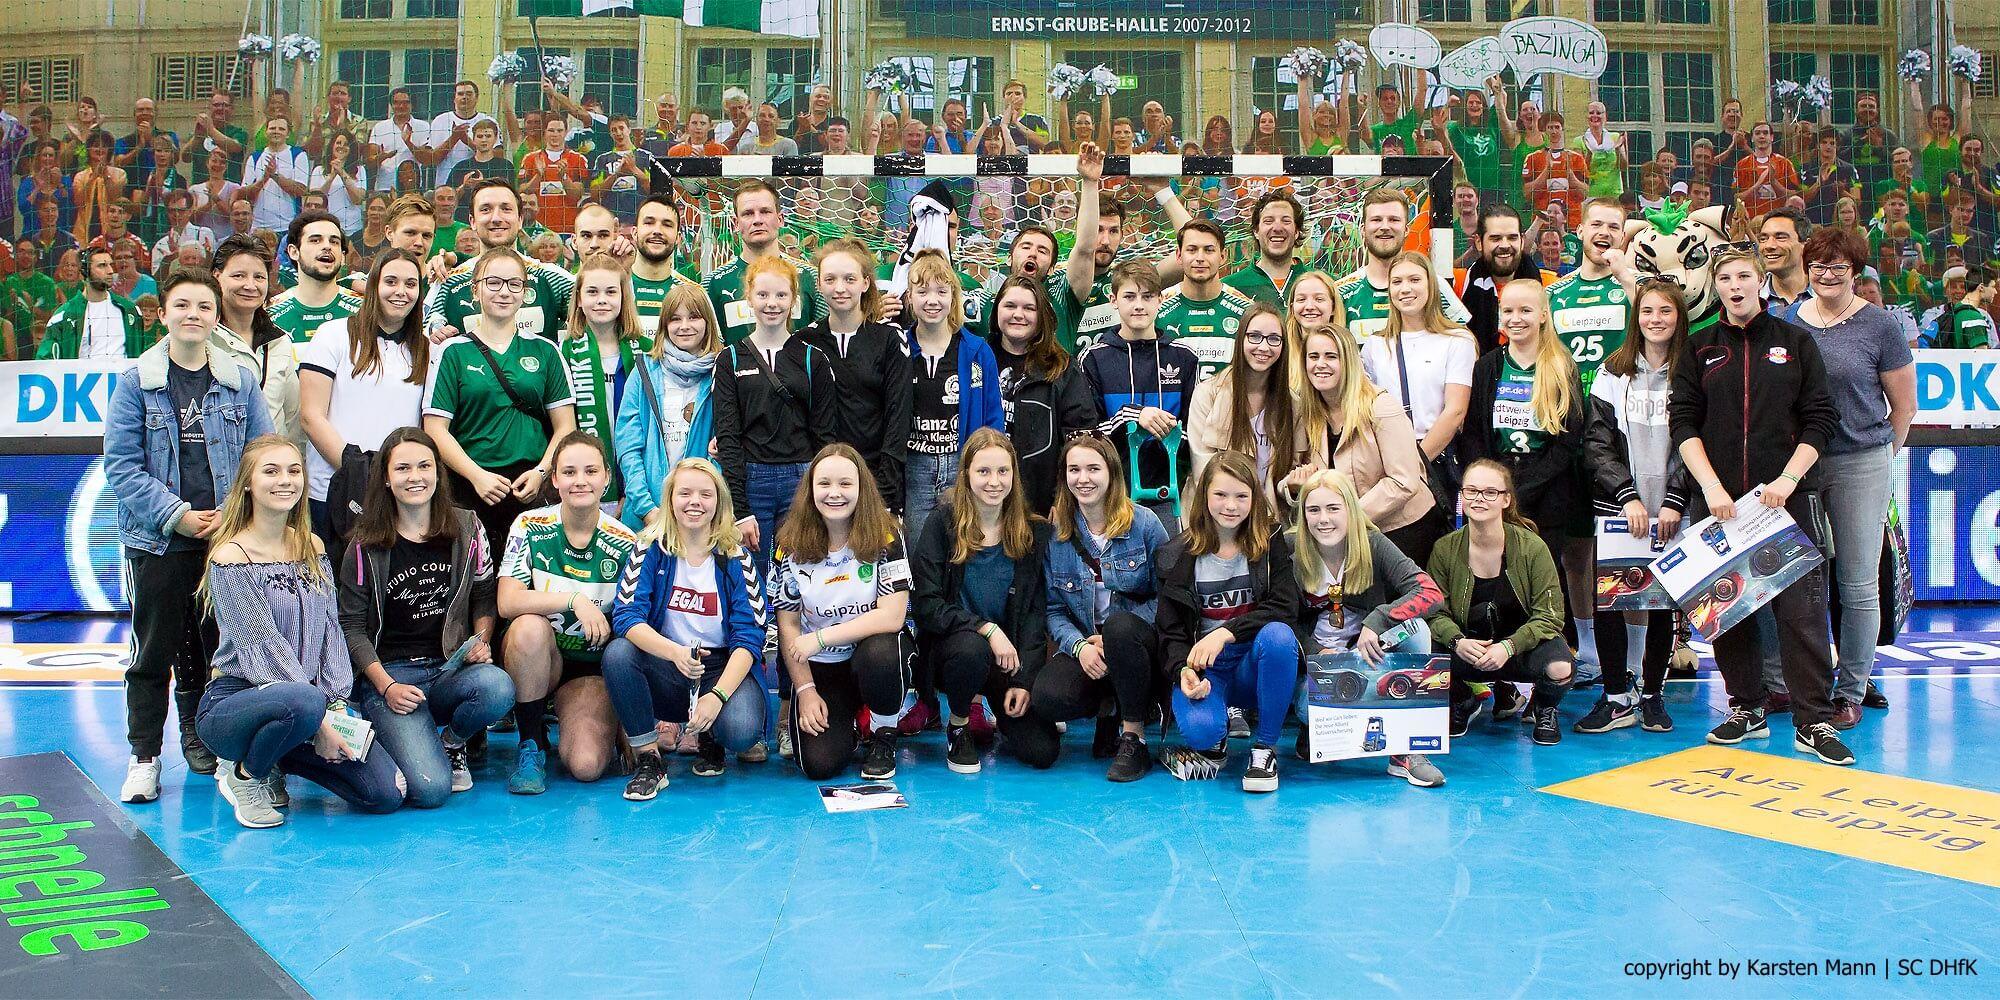 Gruppenfoto, wie es sich wohl jeder Handball-Fan wünscht.